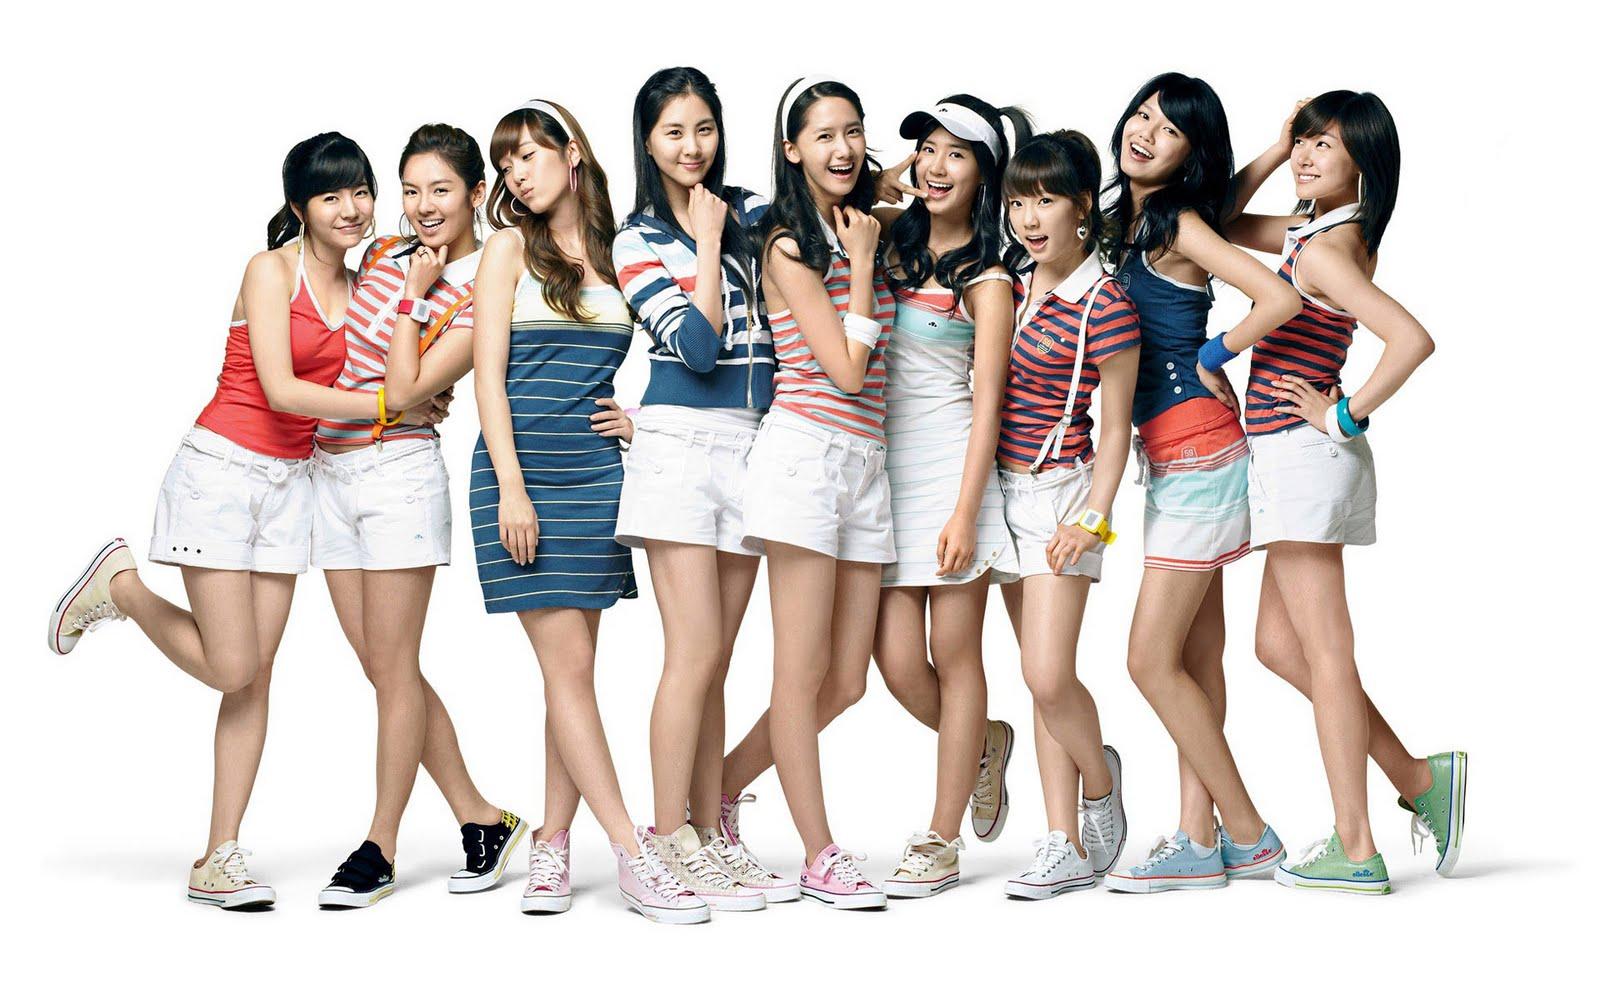 Snsd Girls Generation High Definiton Hd Wallpapers